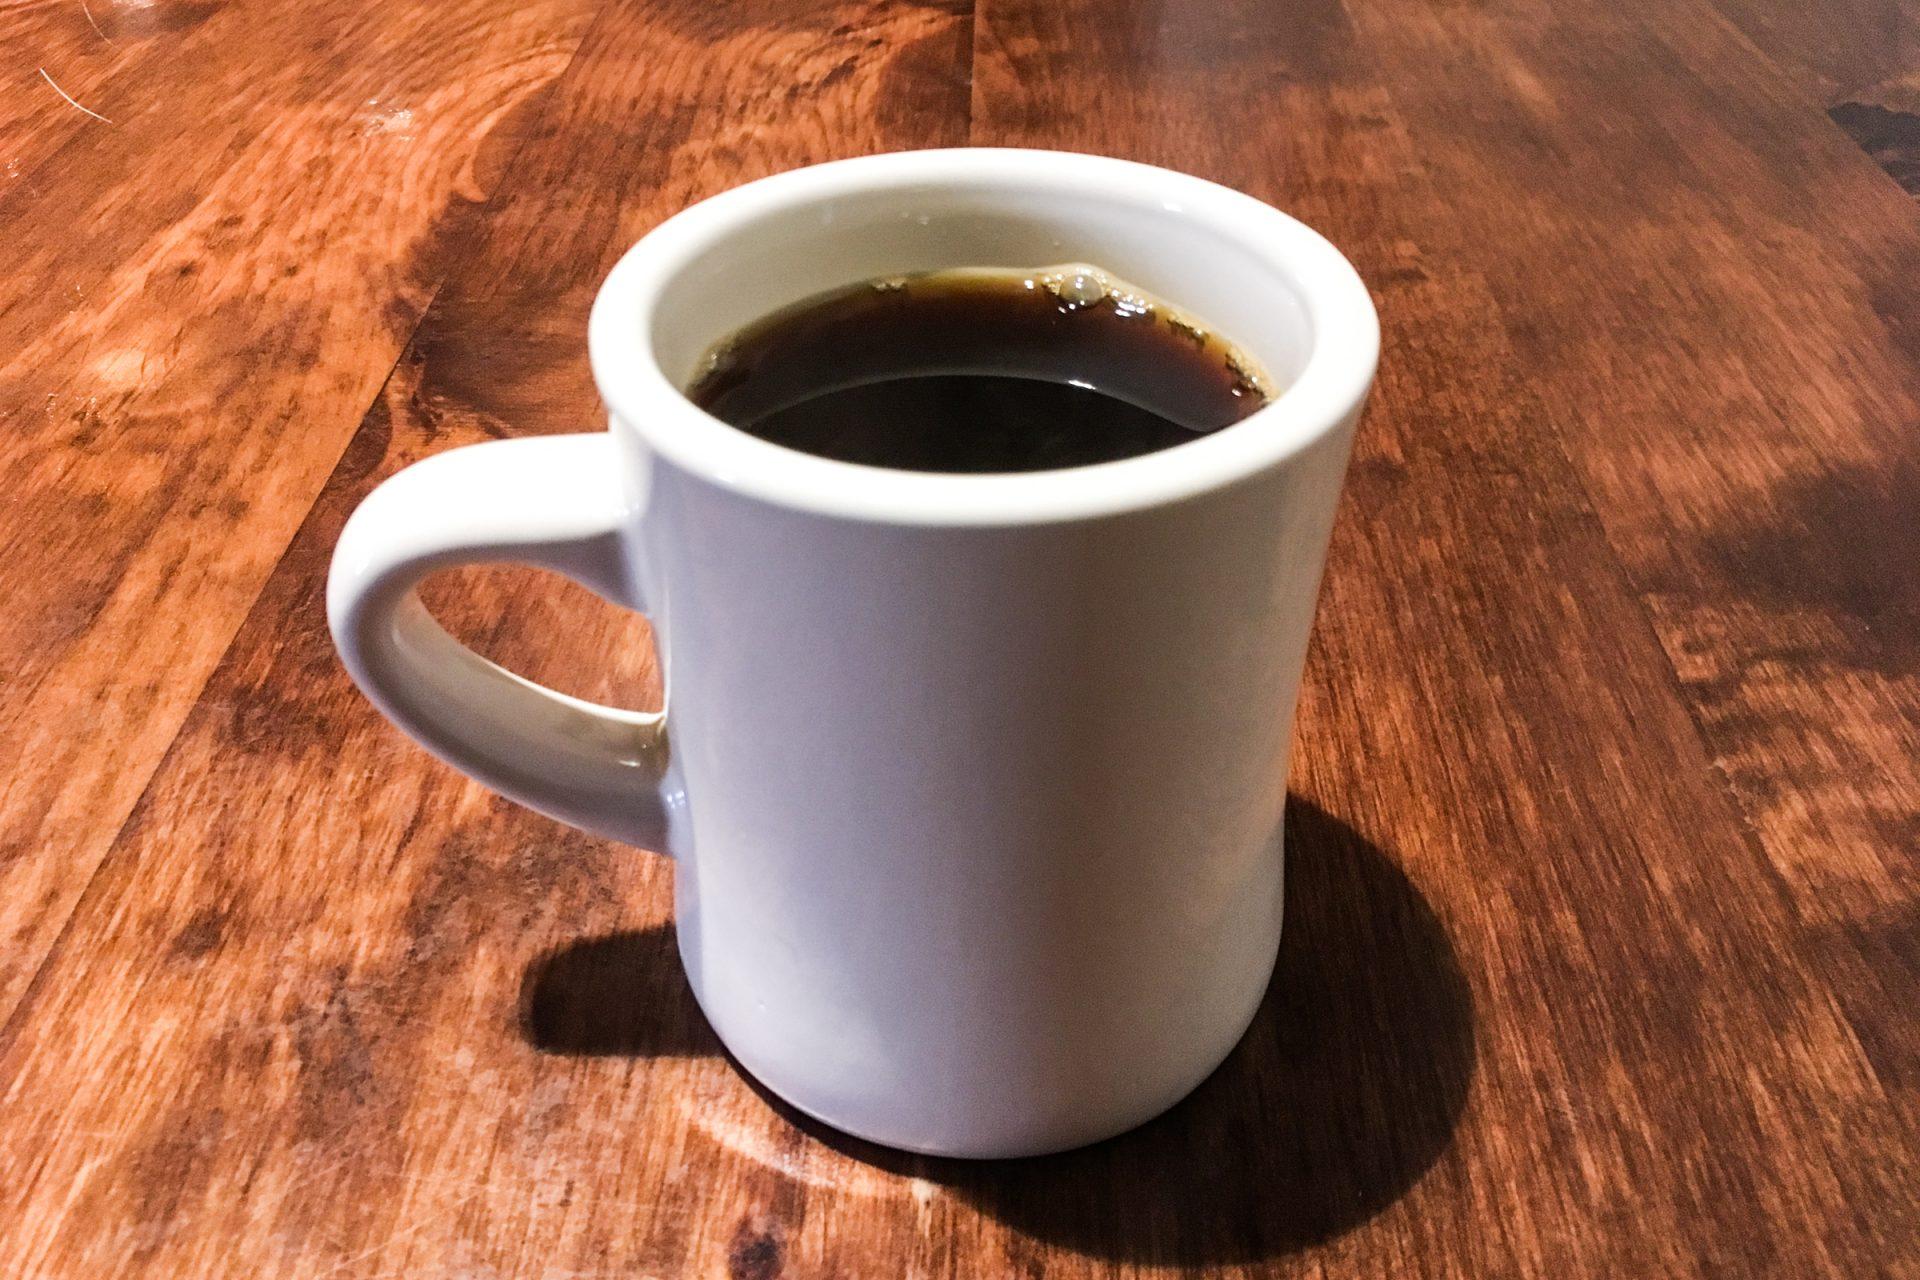 White Mug of Coffee on Wood Table